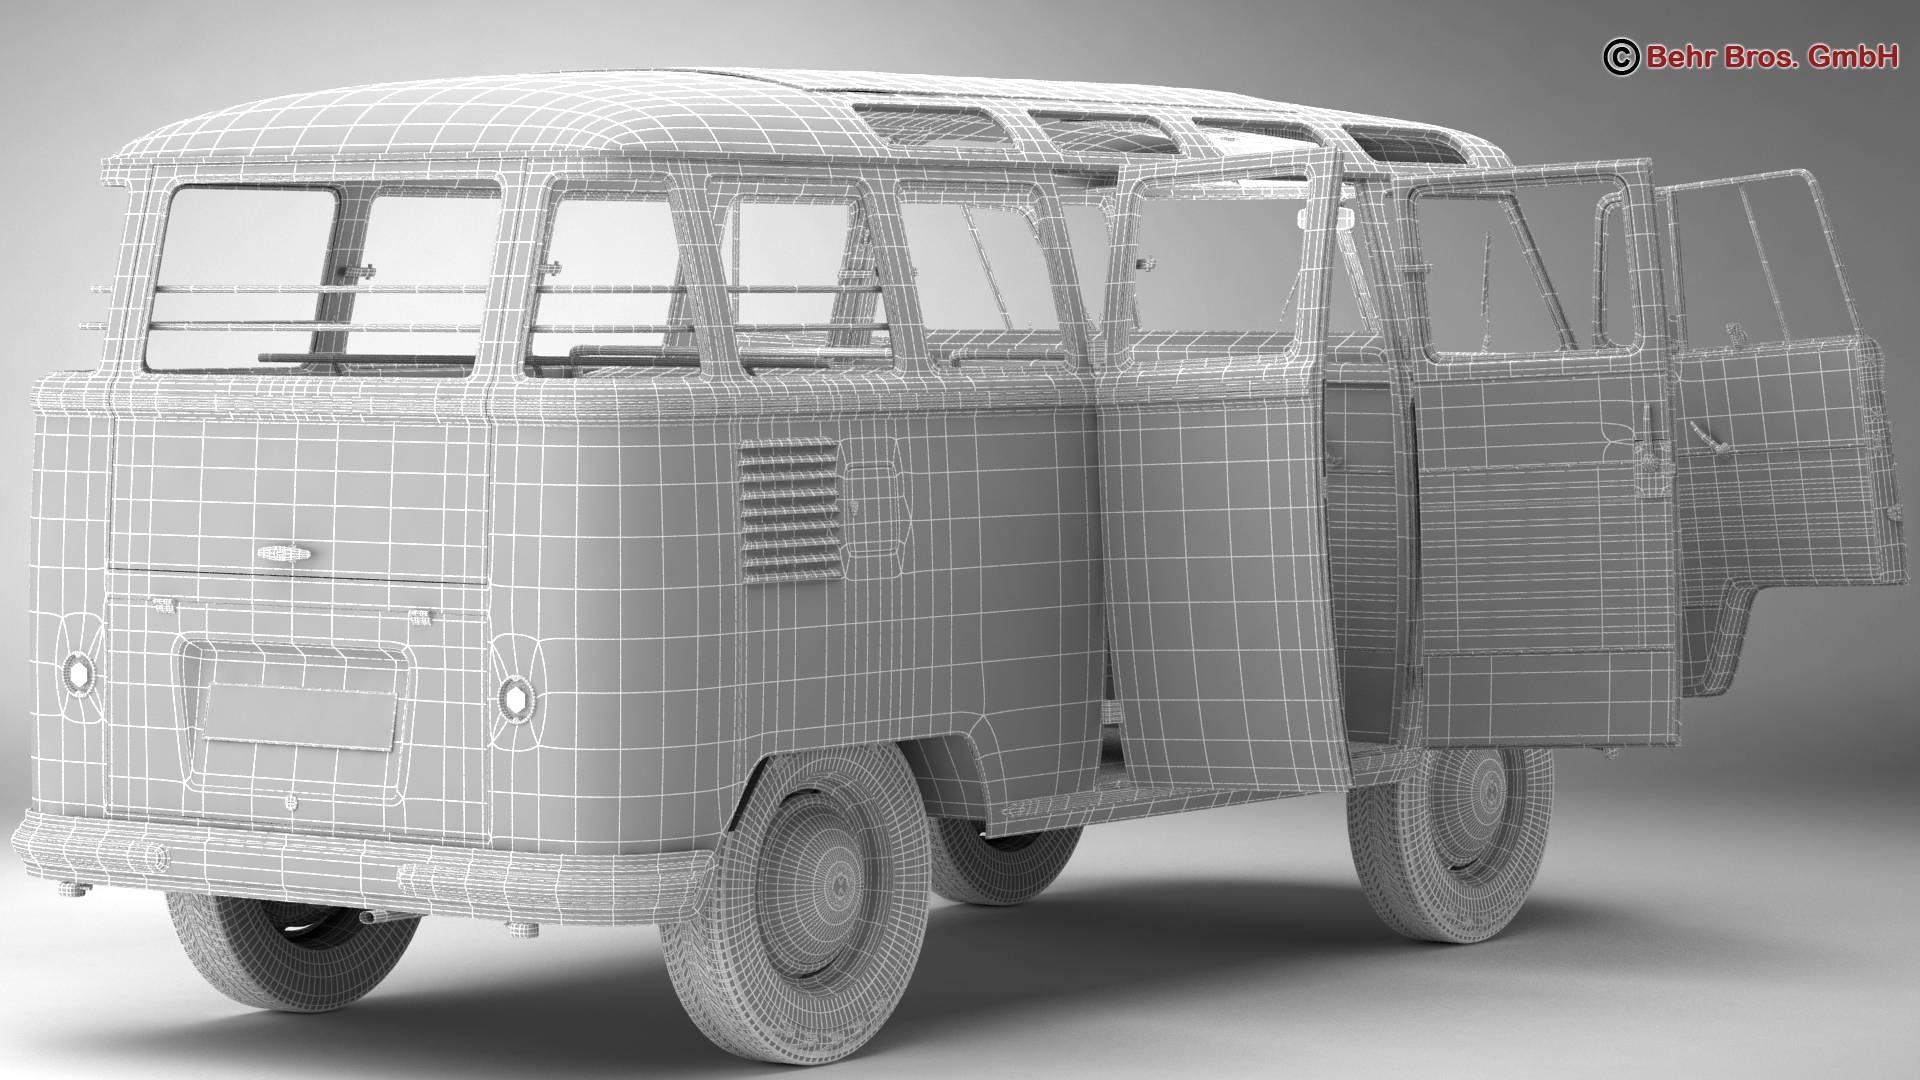 volkswagen type 2 samba 1959 3d model 3ds max fbx c4d lwo ma mb obj 217125